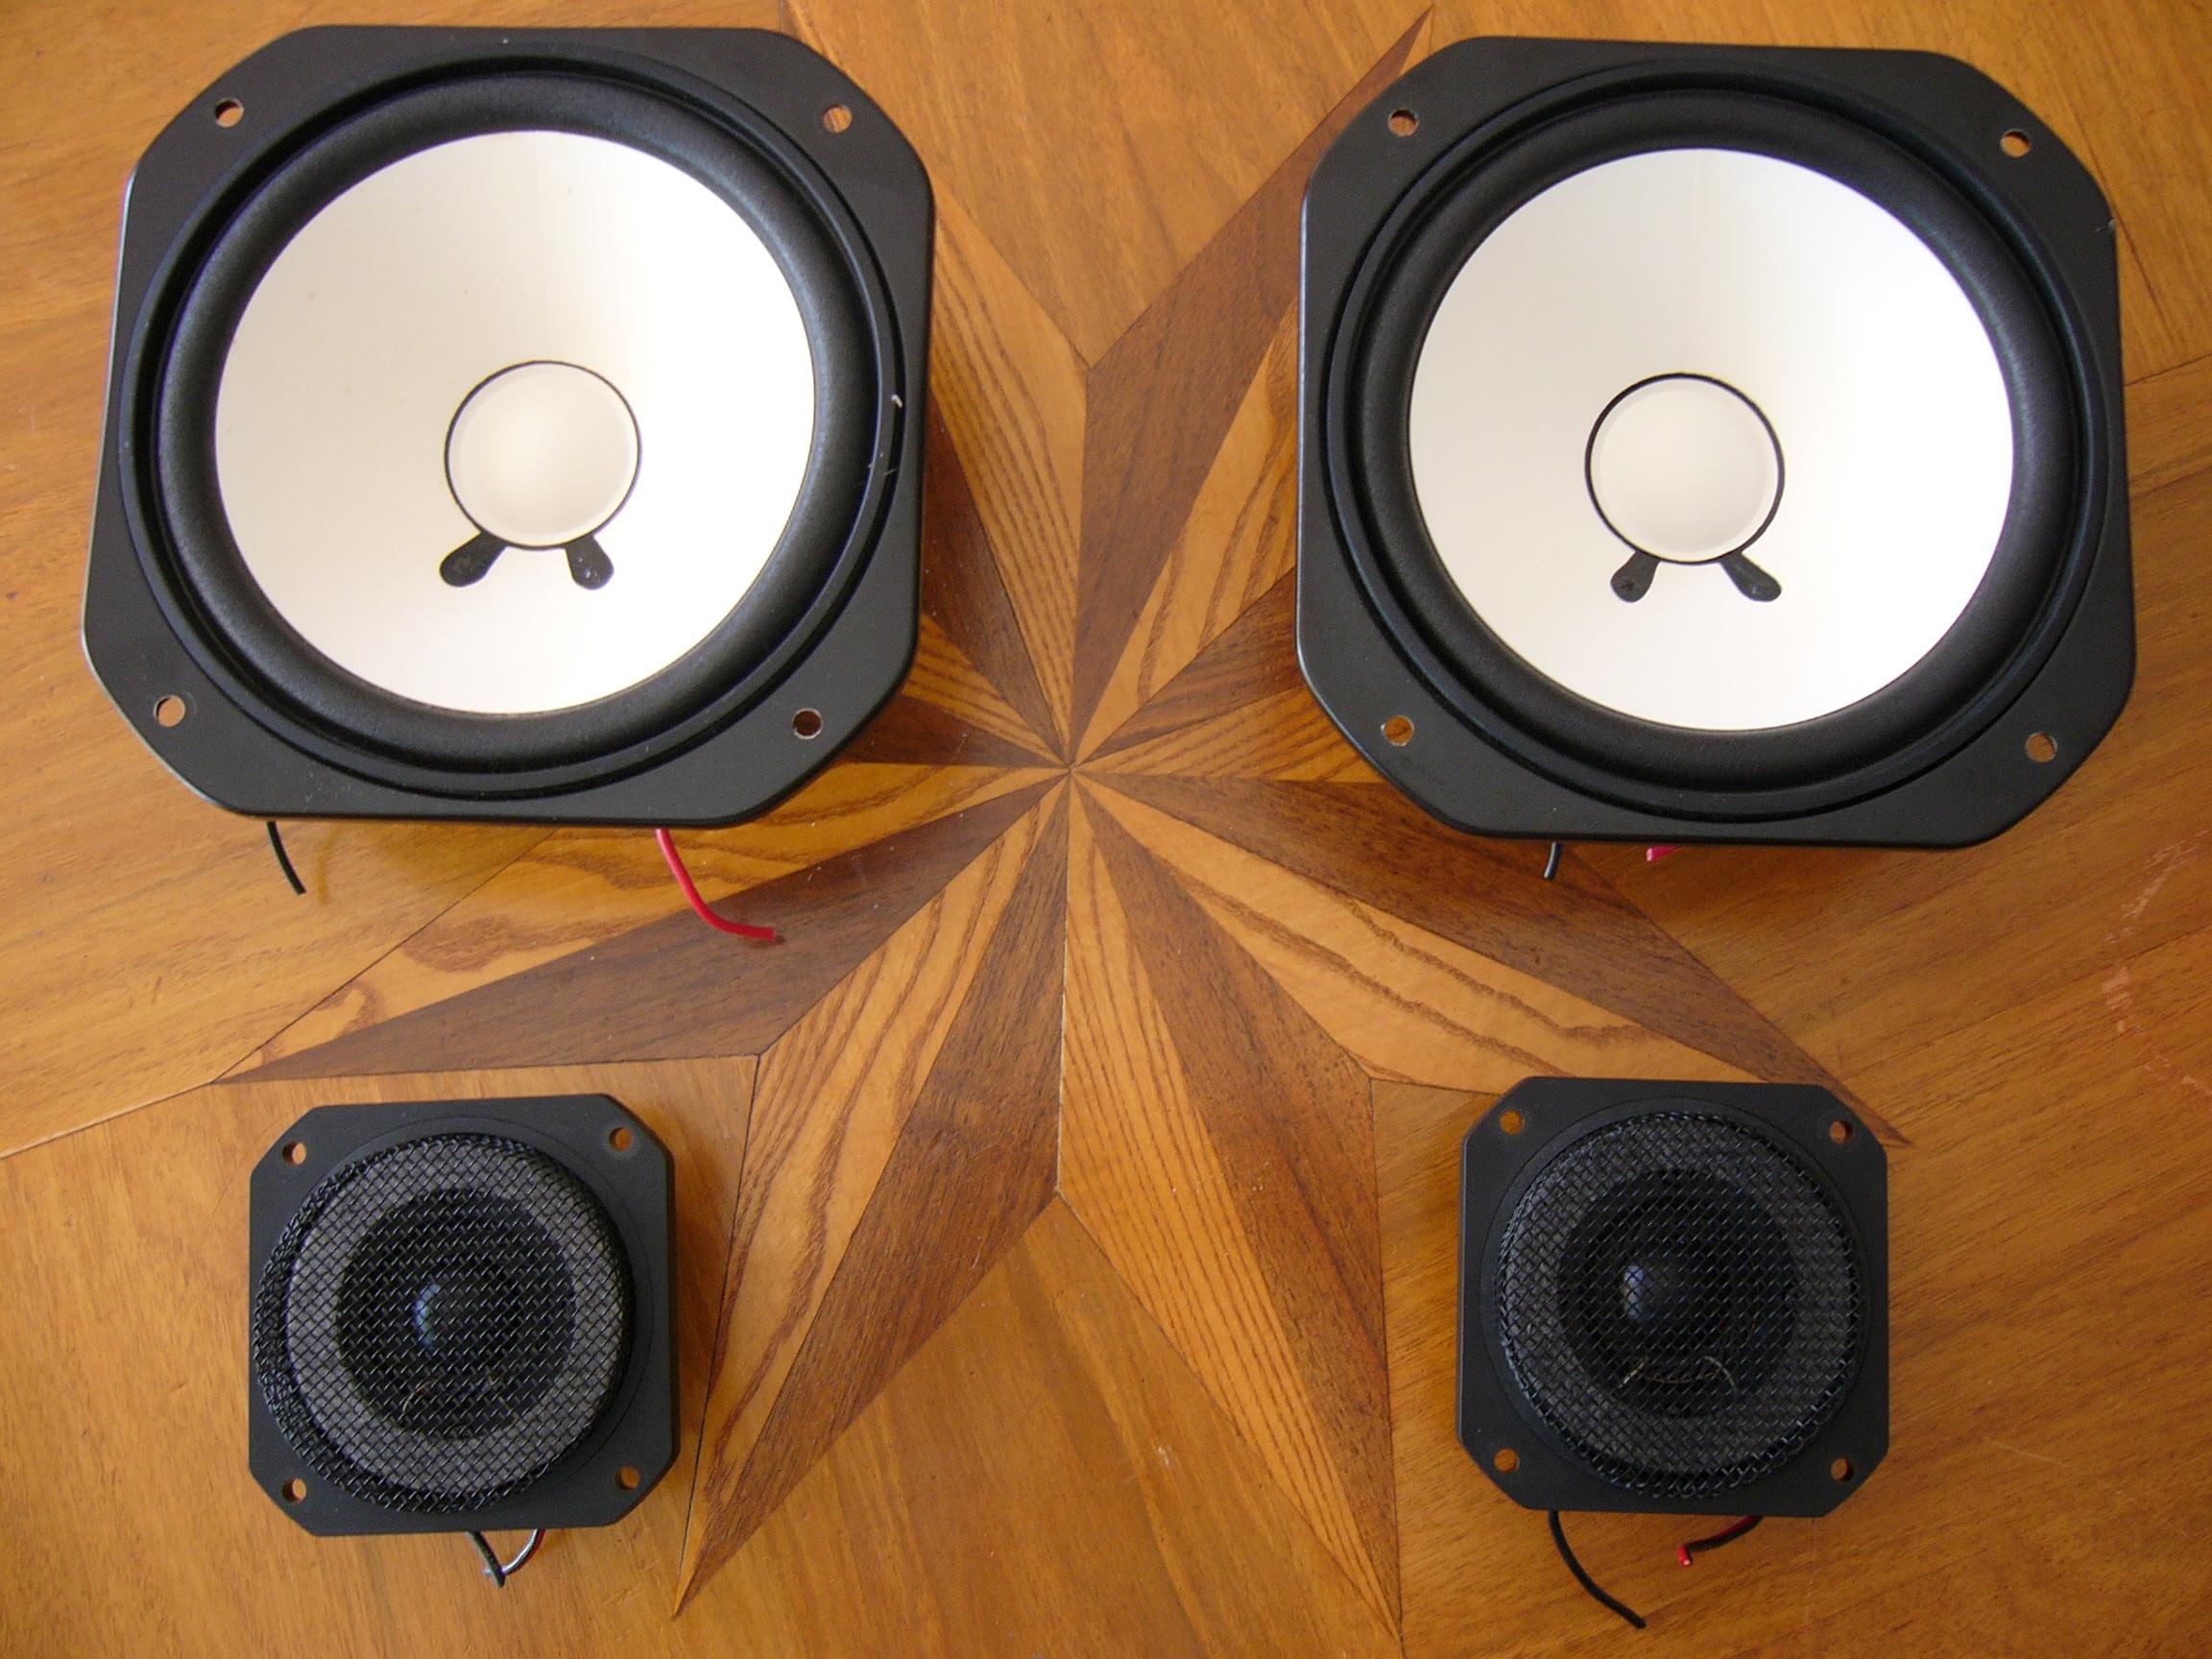 yamaha ns 10m studio image 256176 audiofanzine. Black Bedroom Furniture Sets. Home Design Ideas